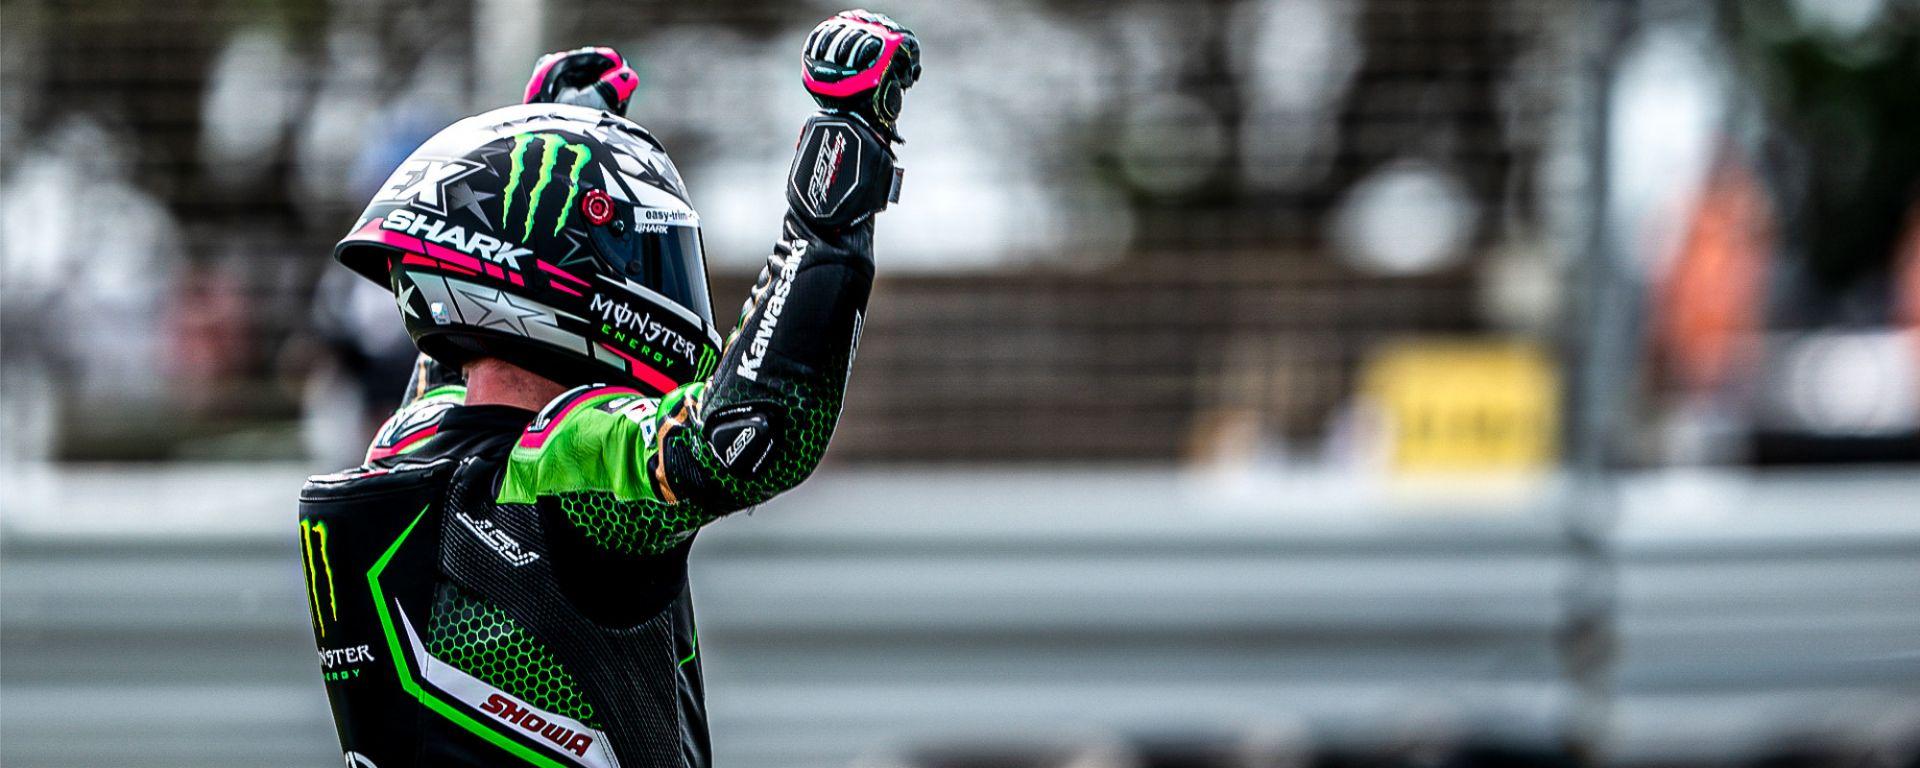 Superbike: Alex Lowes e Kawasaki insieme anche nel 2021